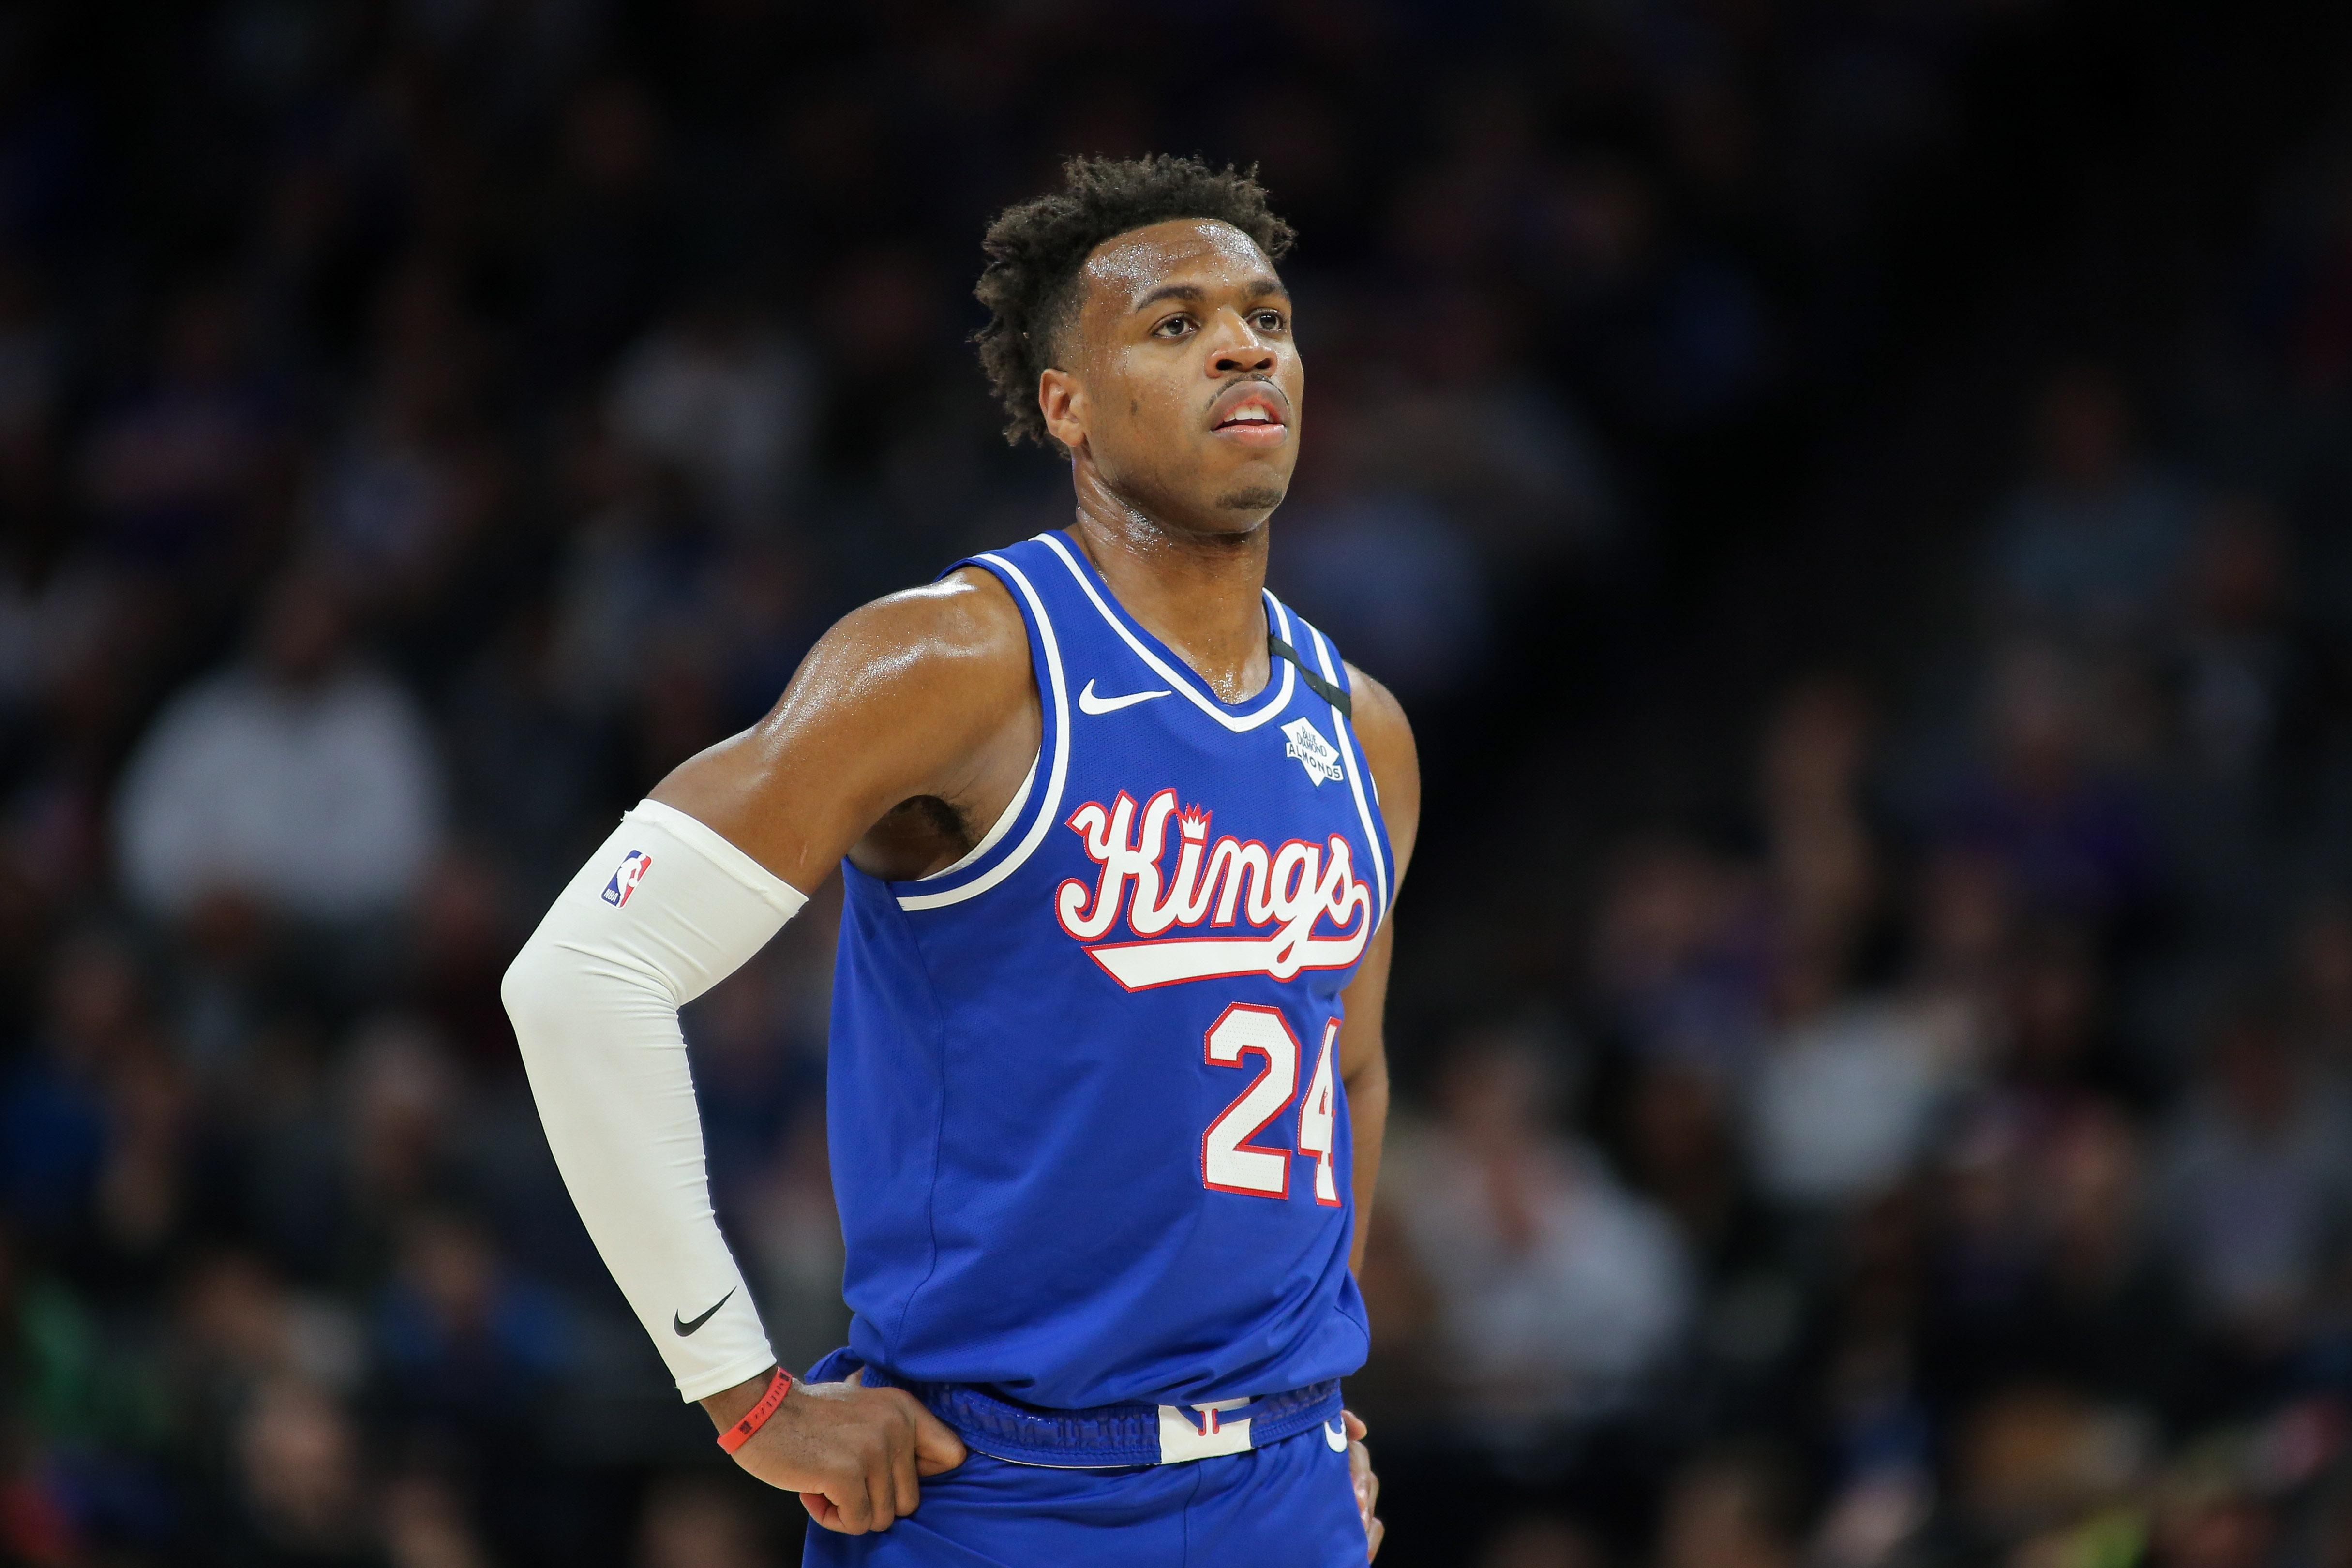 Buddy Hield Trade Rumors 76ers Knicks Kings Landing Spots Destinations